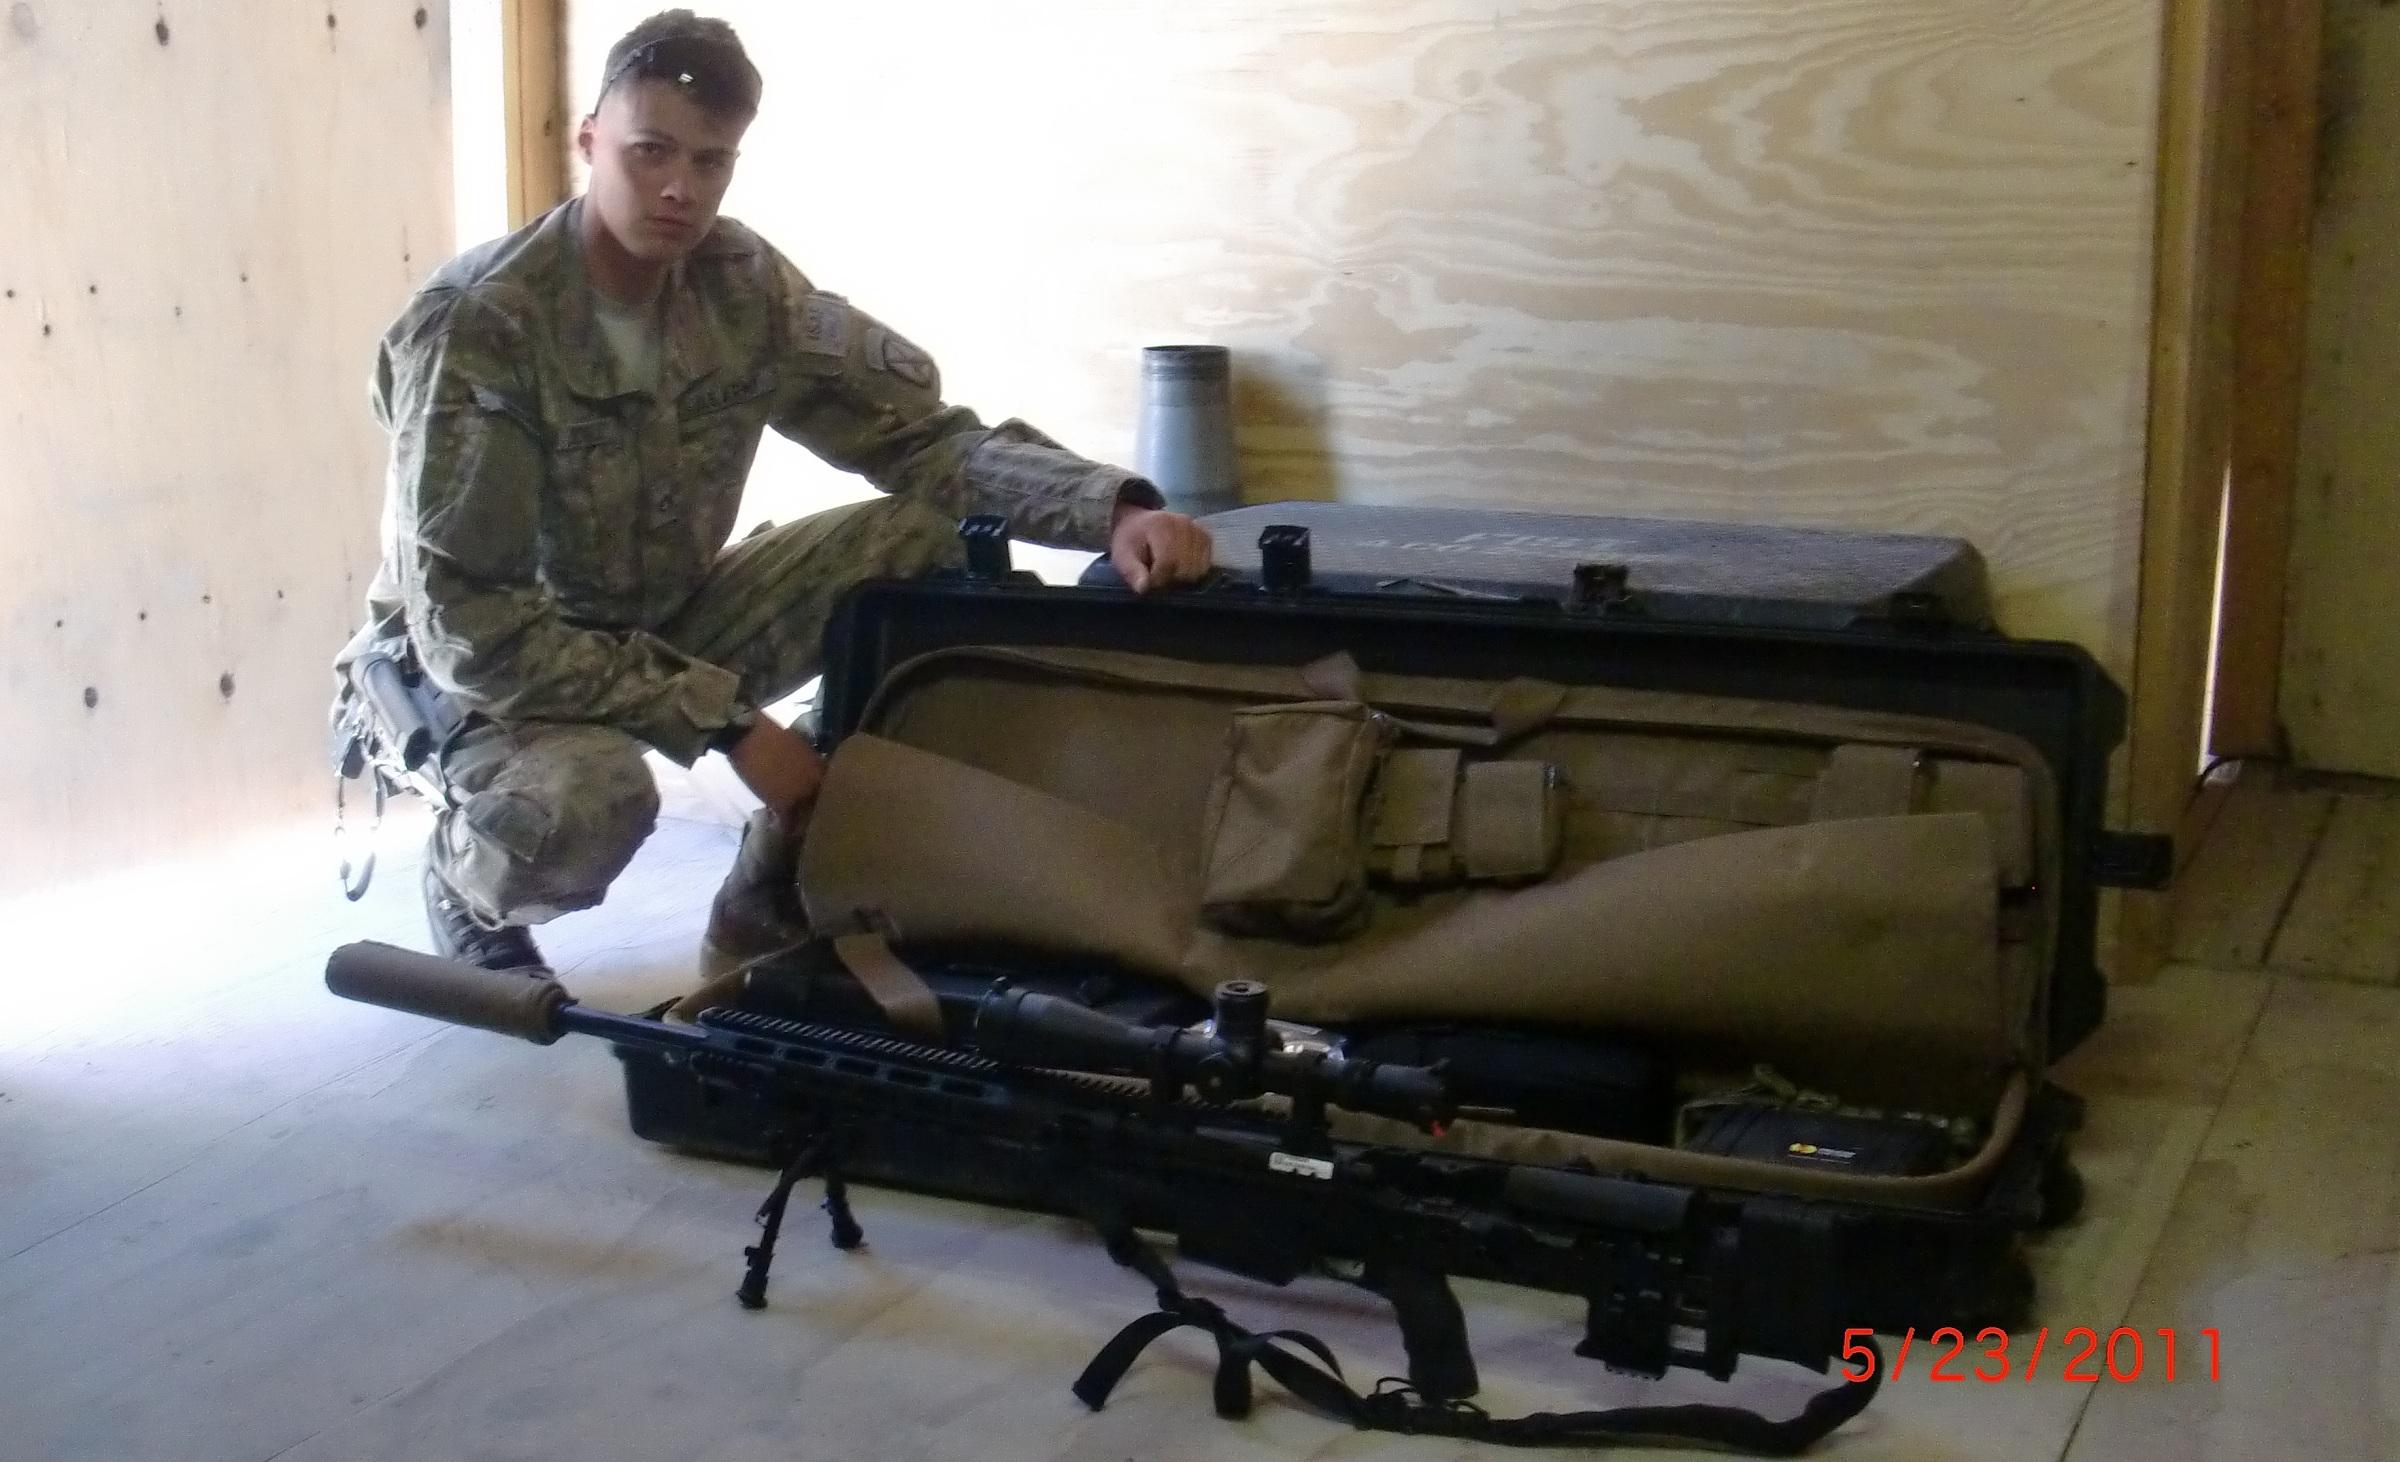 Corey Schultz with XM2010 Sniper Rifle